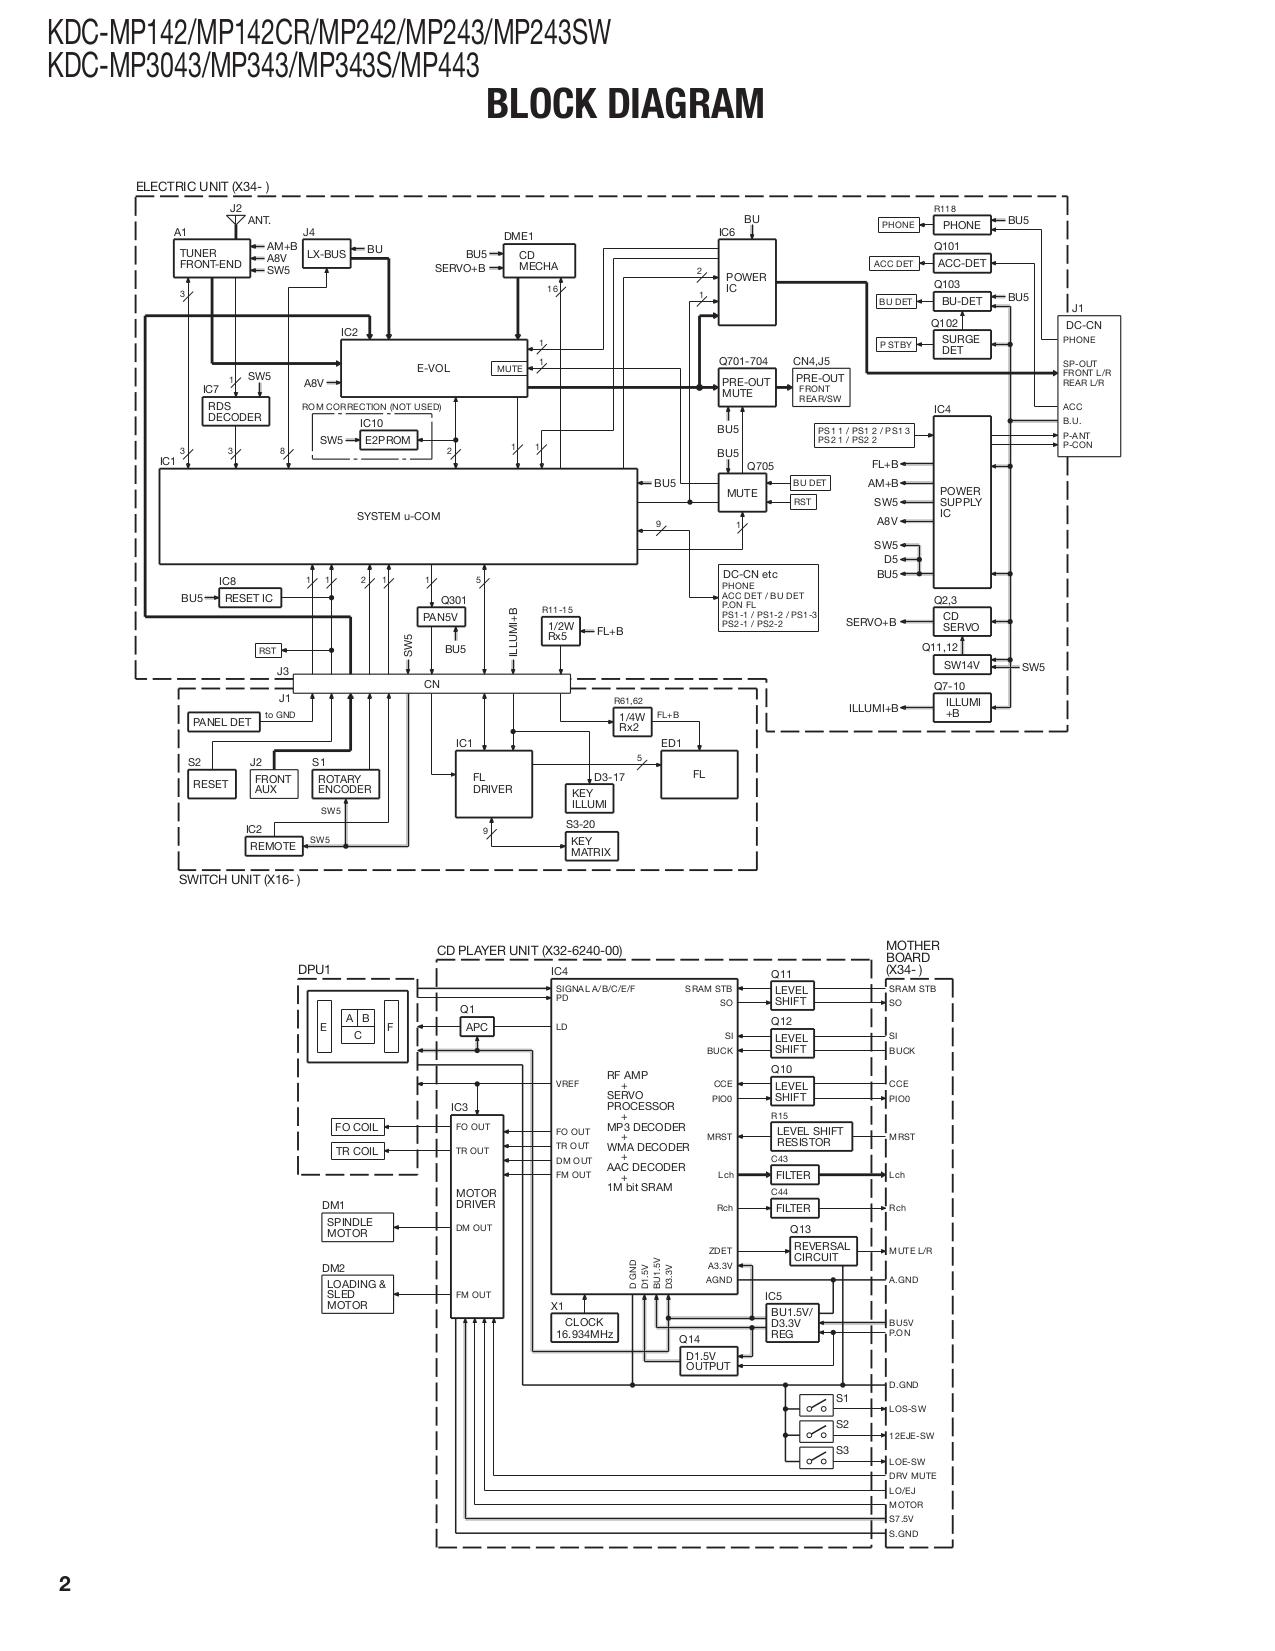 [DIAGRAM_3US]  LL_1880] For A Kenwood Kdc Mp142 Wiring Diagram Download Diagram | Kenwood Kdc Mp142 Wiring Diagram |  | Unbe Nerve Groa Chro Leona Siry Inama Mohammedshrine Librar Wiring 101